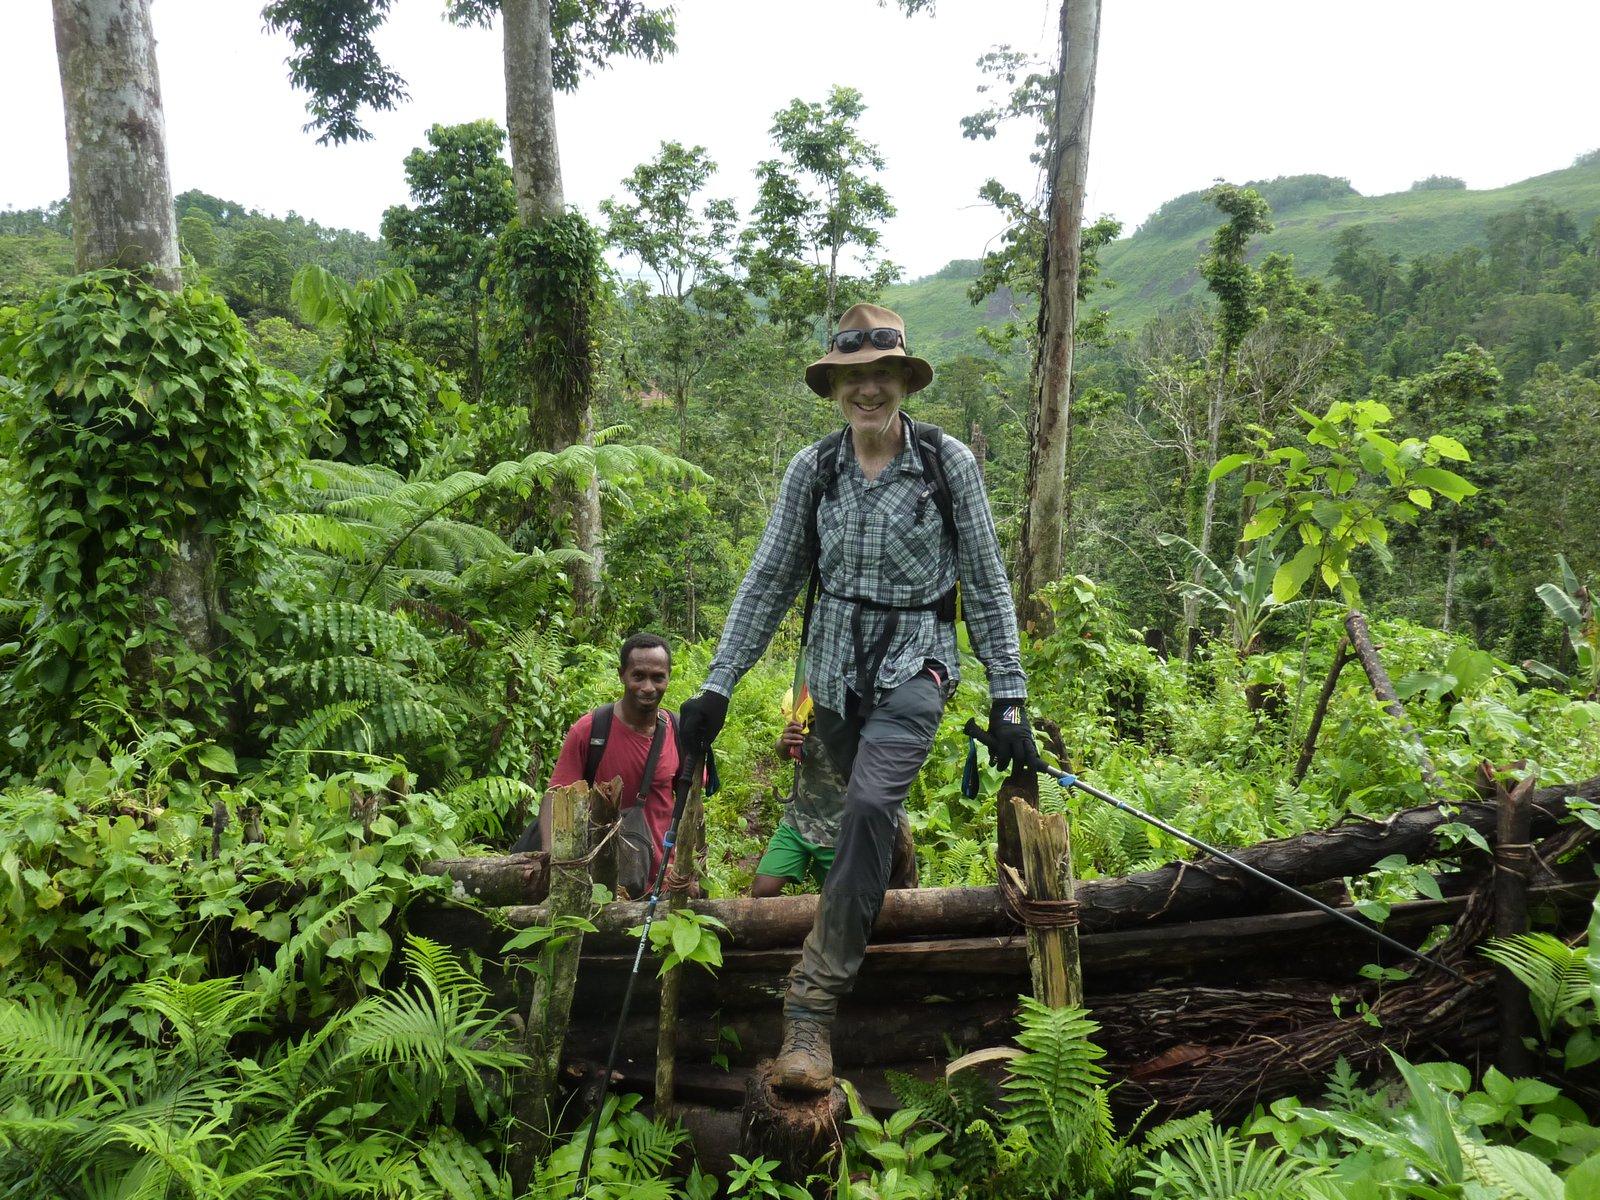 Jim Phillipson makes the trek through the forests of central Malaita, Solomon Islands